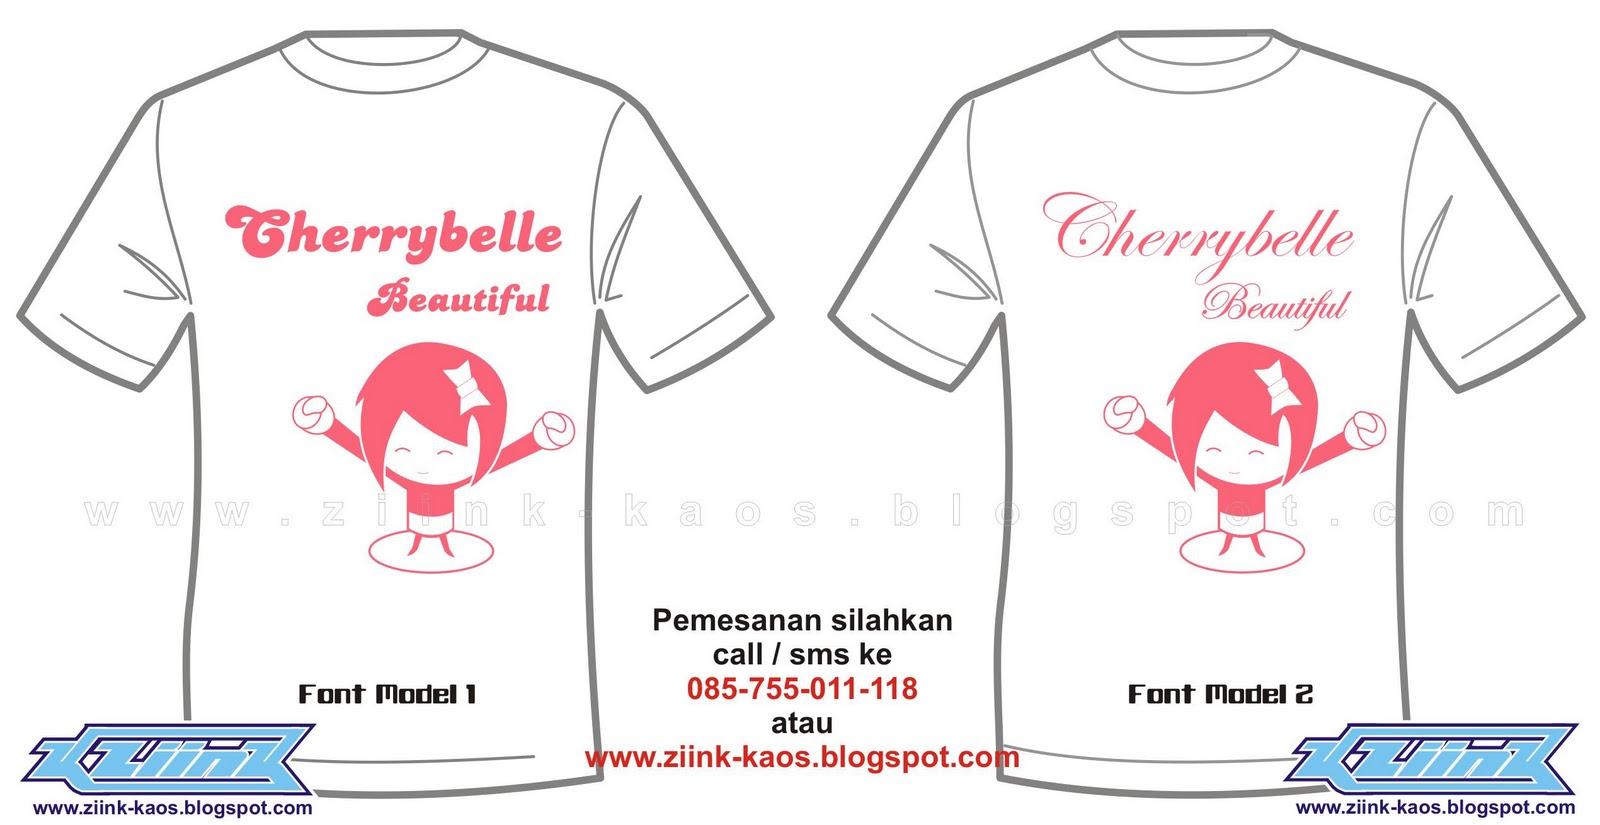 Kaos Lucu Cherry Belle (ChiBi) - Kaos Online Satuan & Lusinan